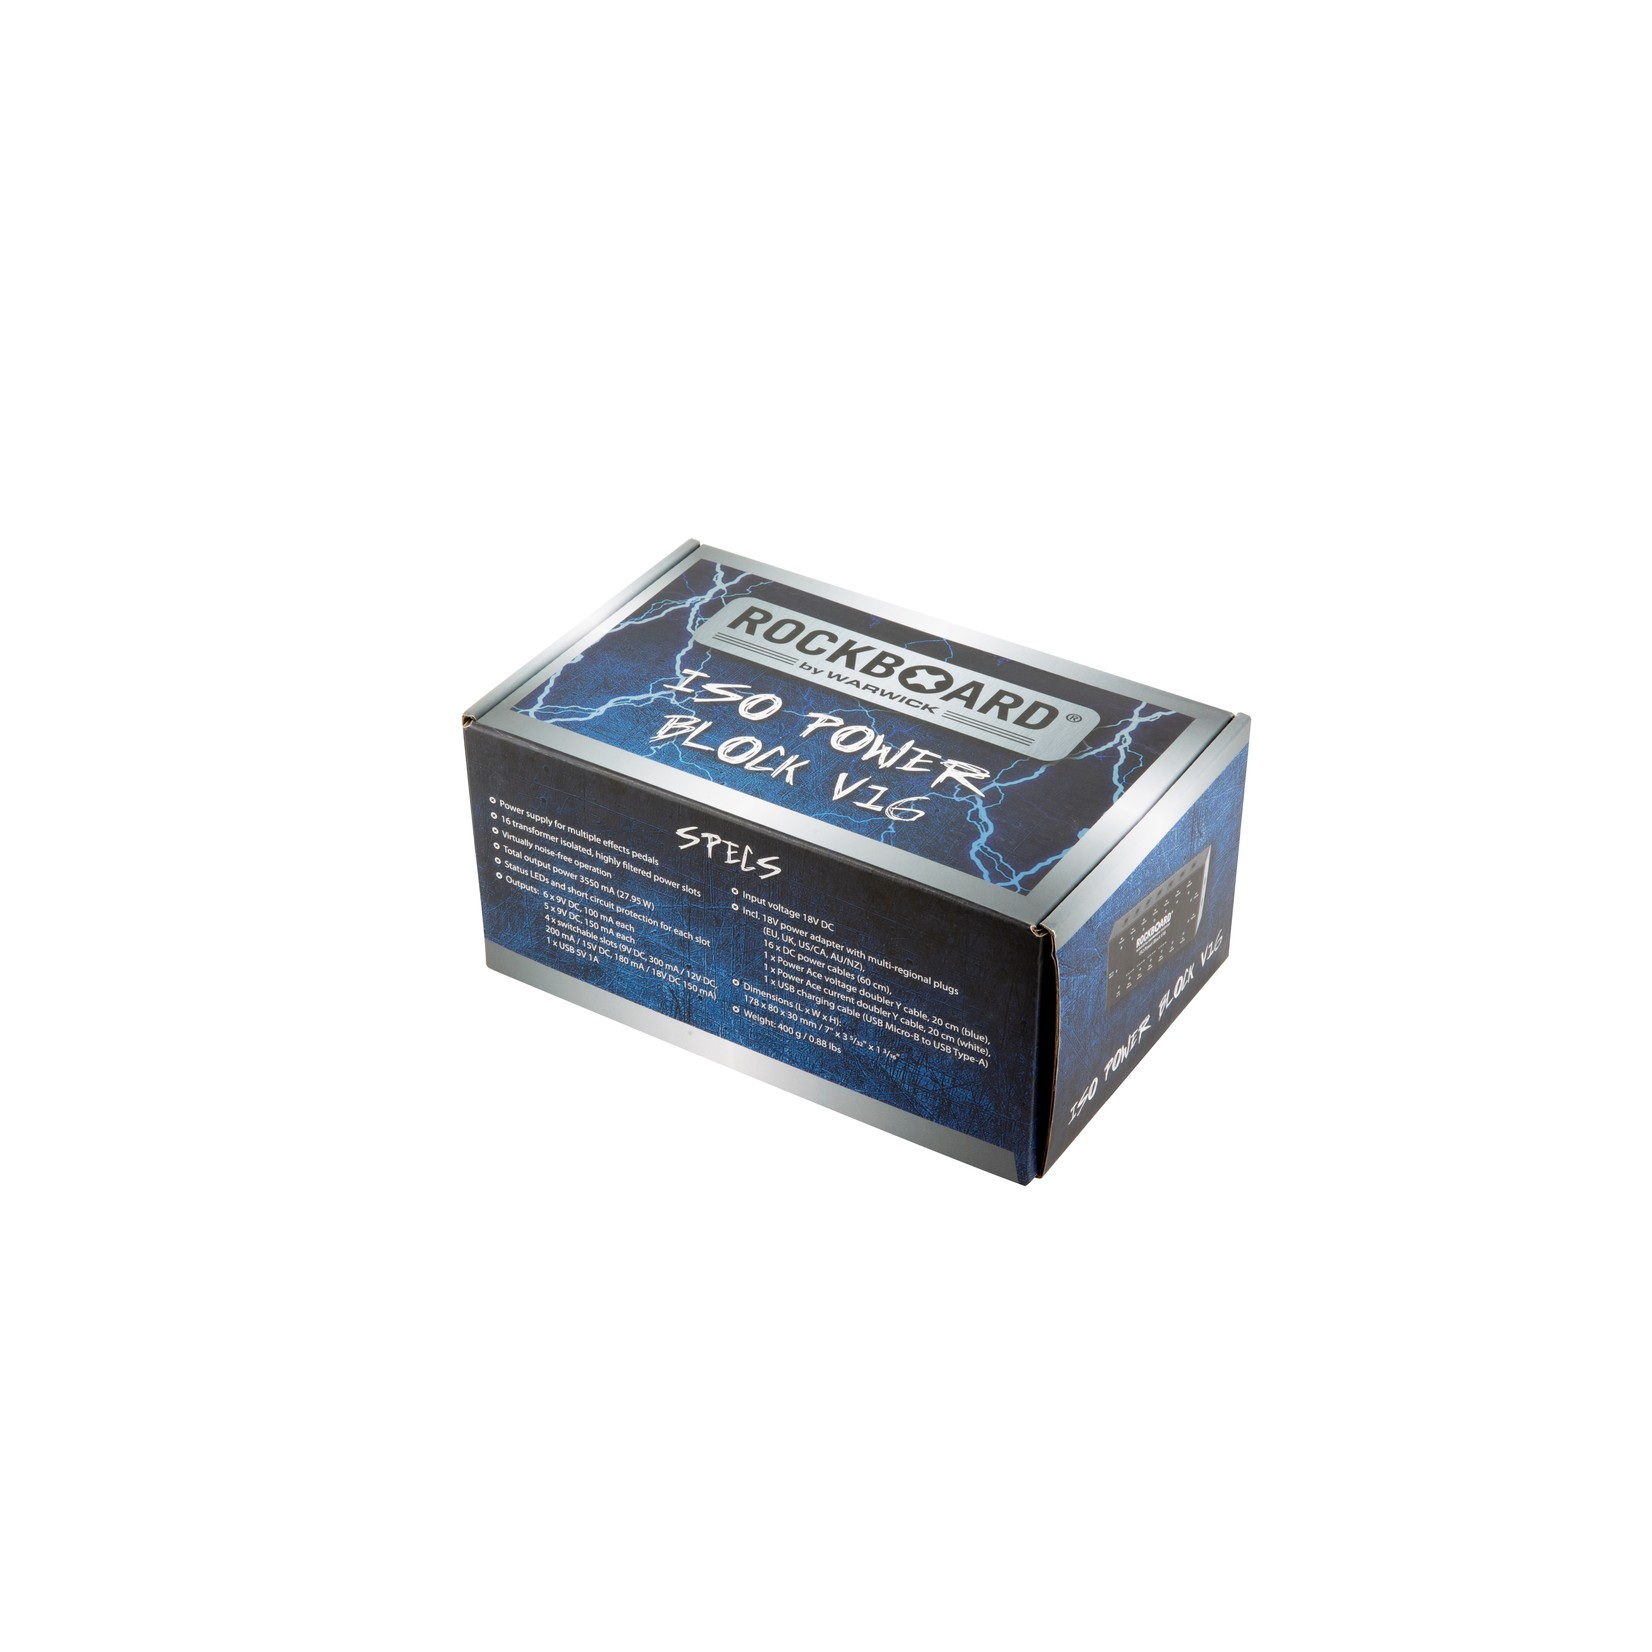 Rockboard Rockboard ISO Power Block V16 Isolated Pedal Multi-Power Supply (9V, 12V, 15V, 18V, USB)